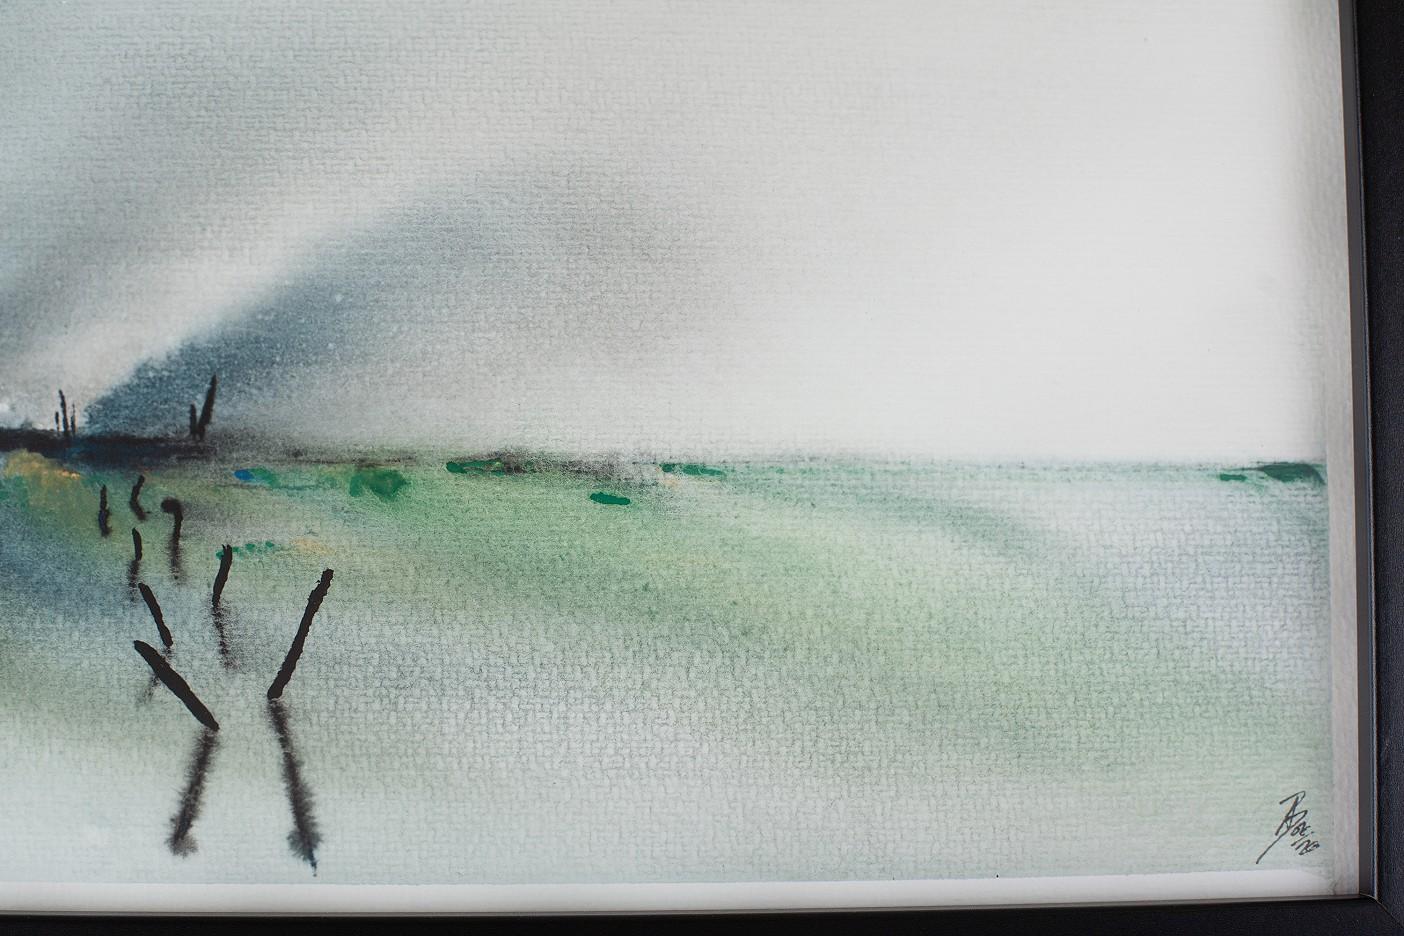 Misty Shore no. 104